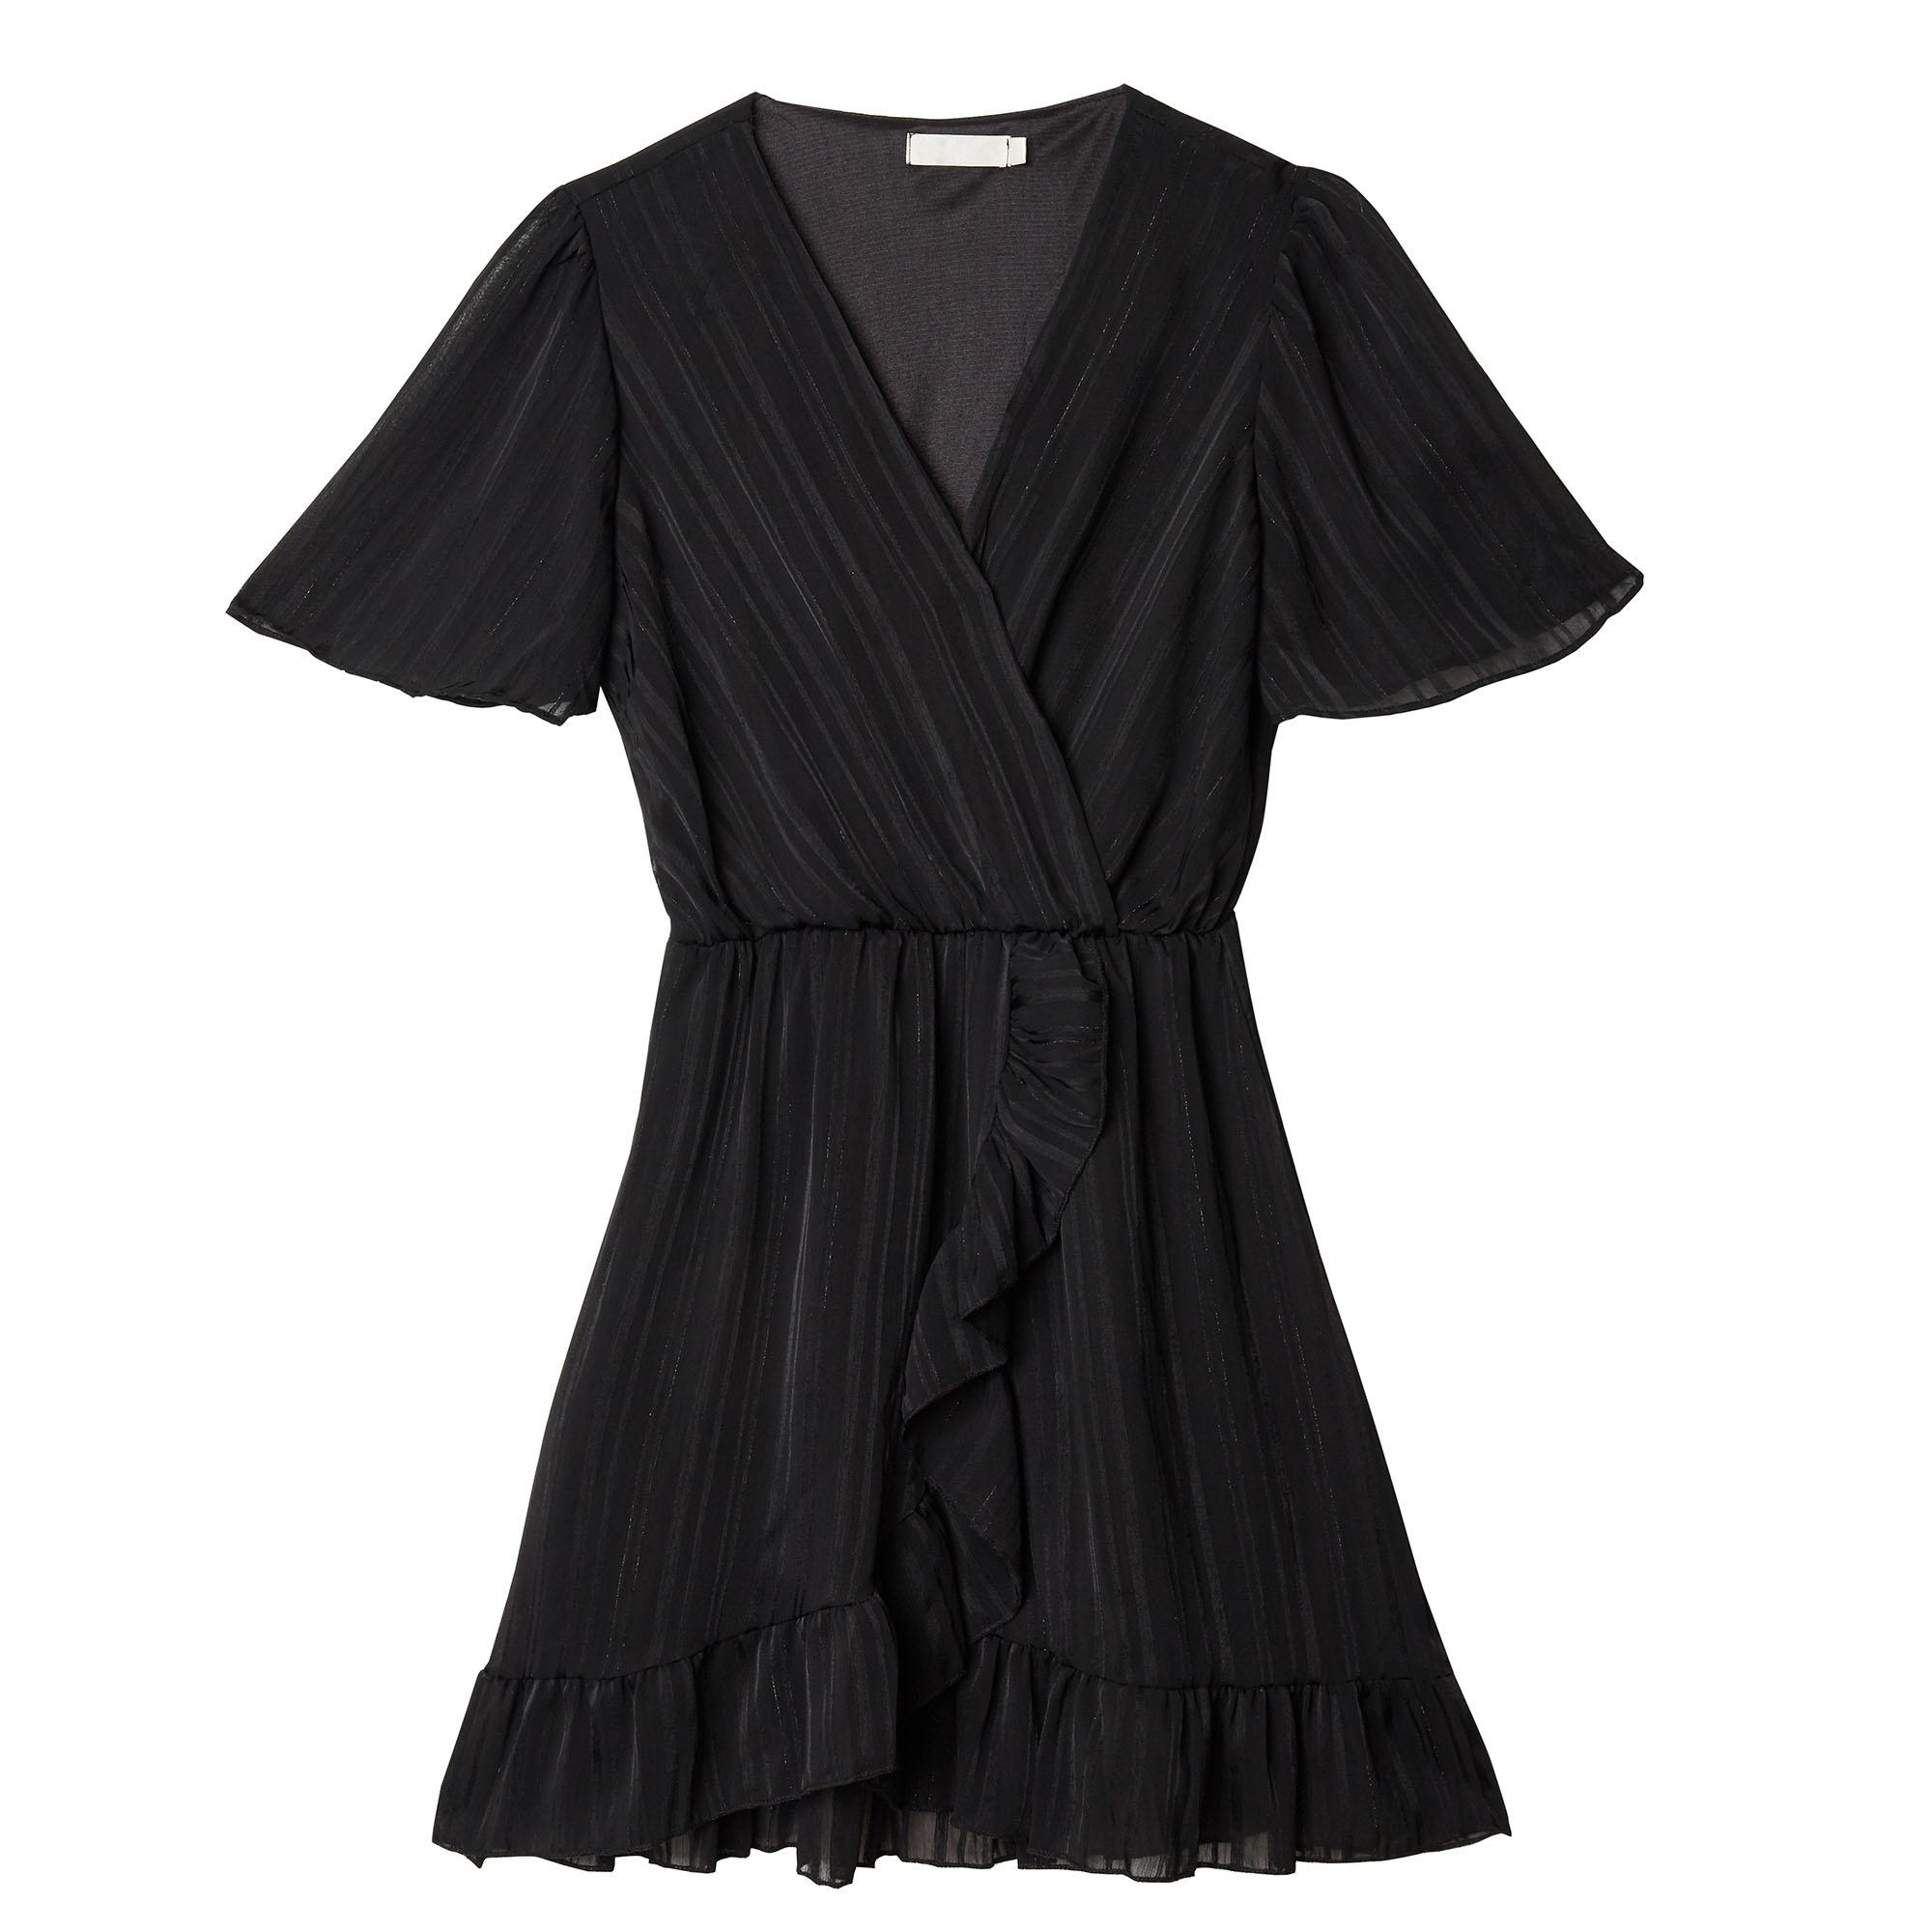 YW Axelle Stripes Dress Black